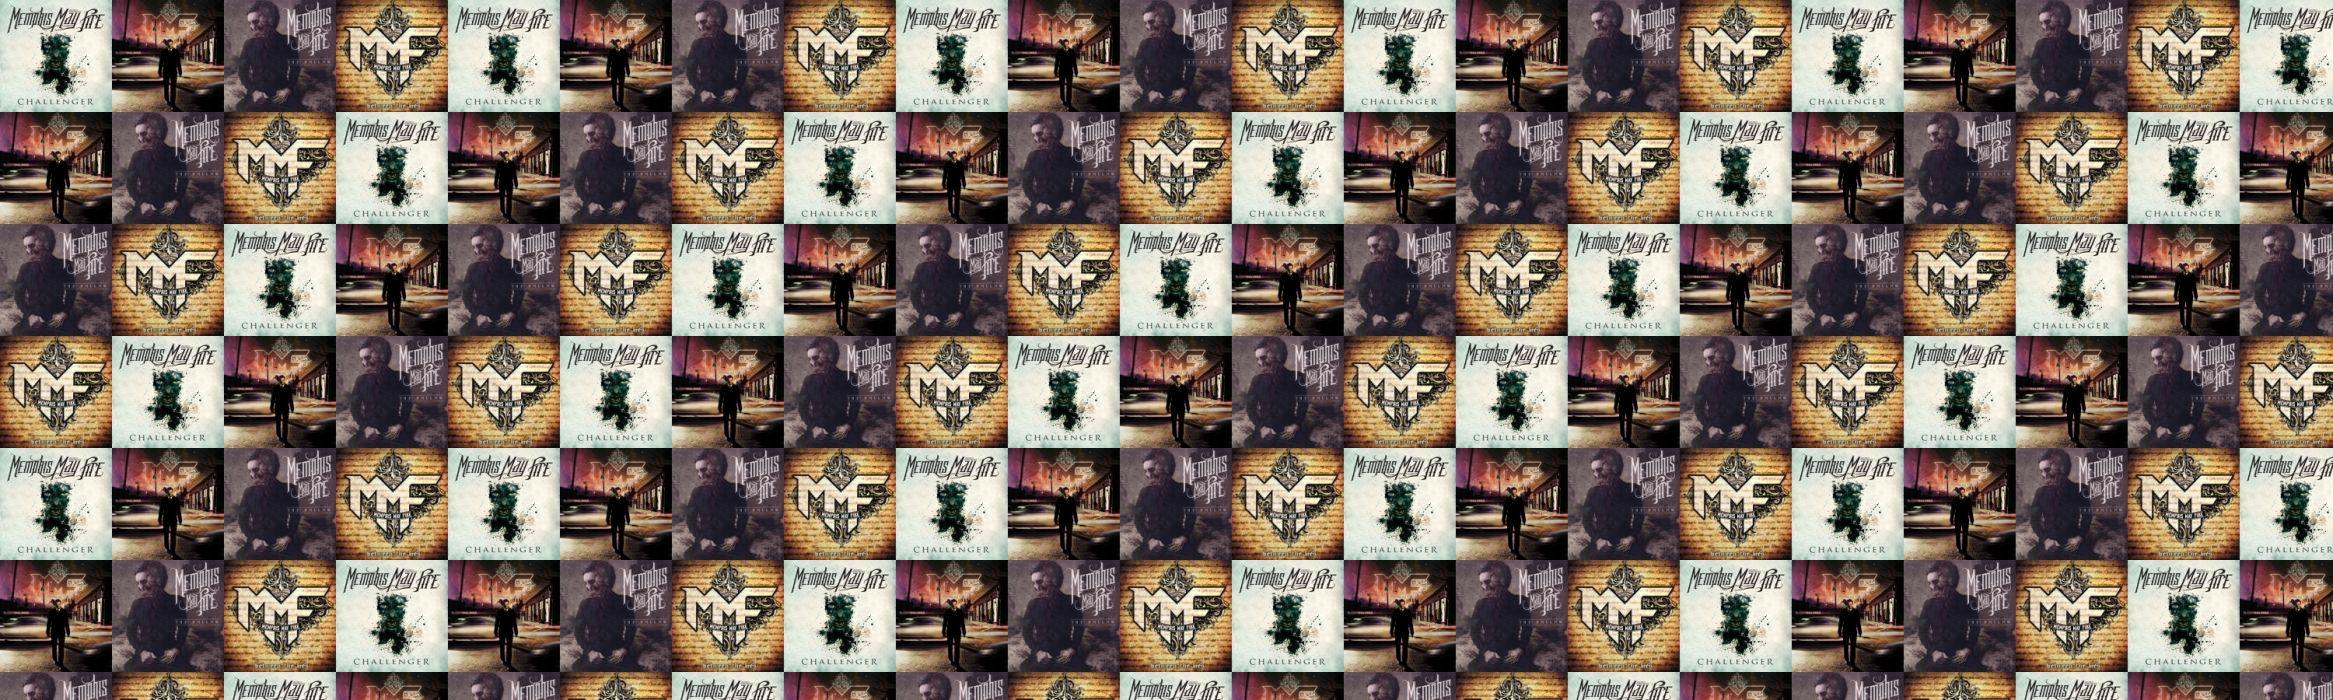 collage tile tiles music dual multi         w wallpaper